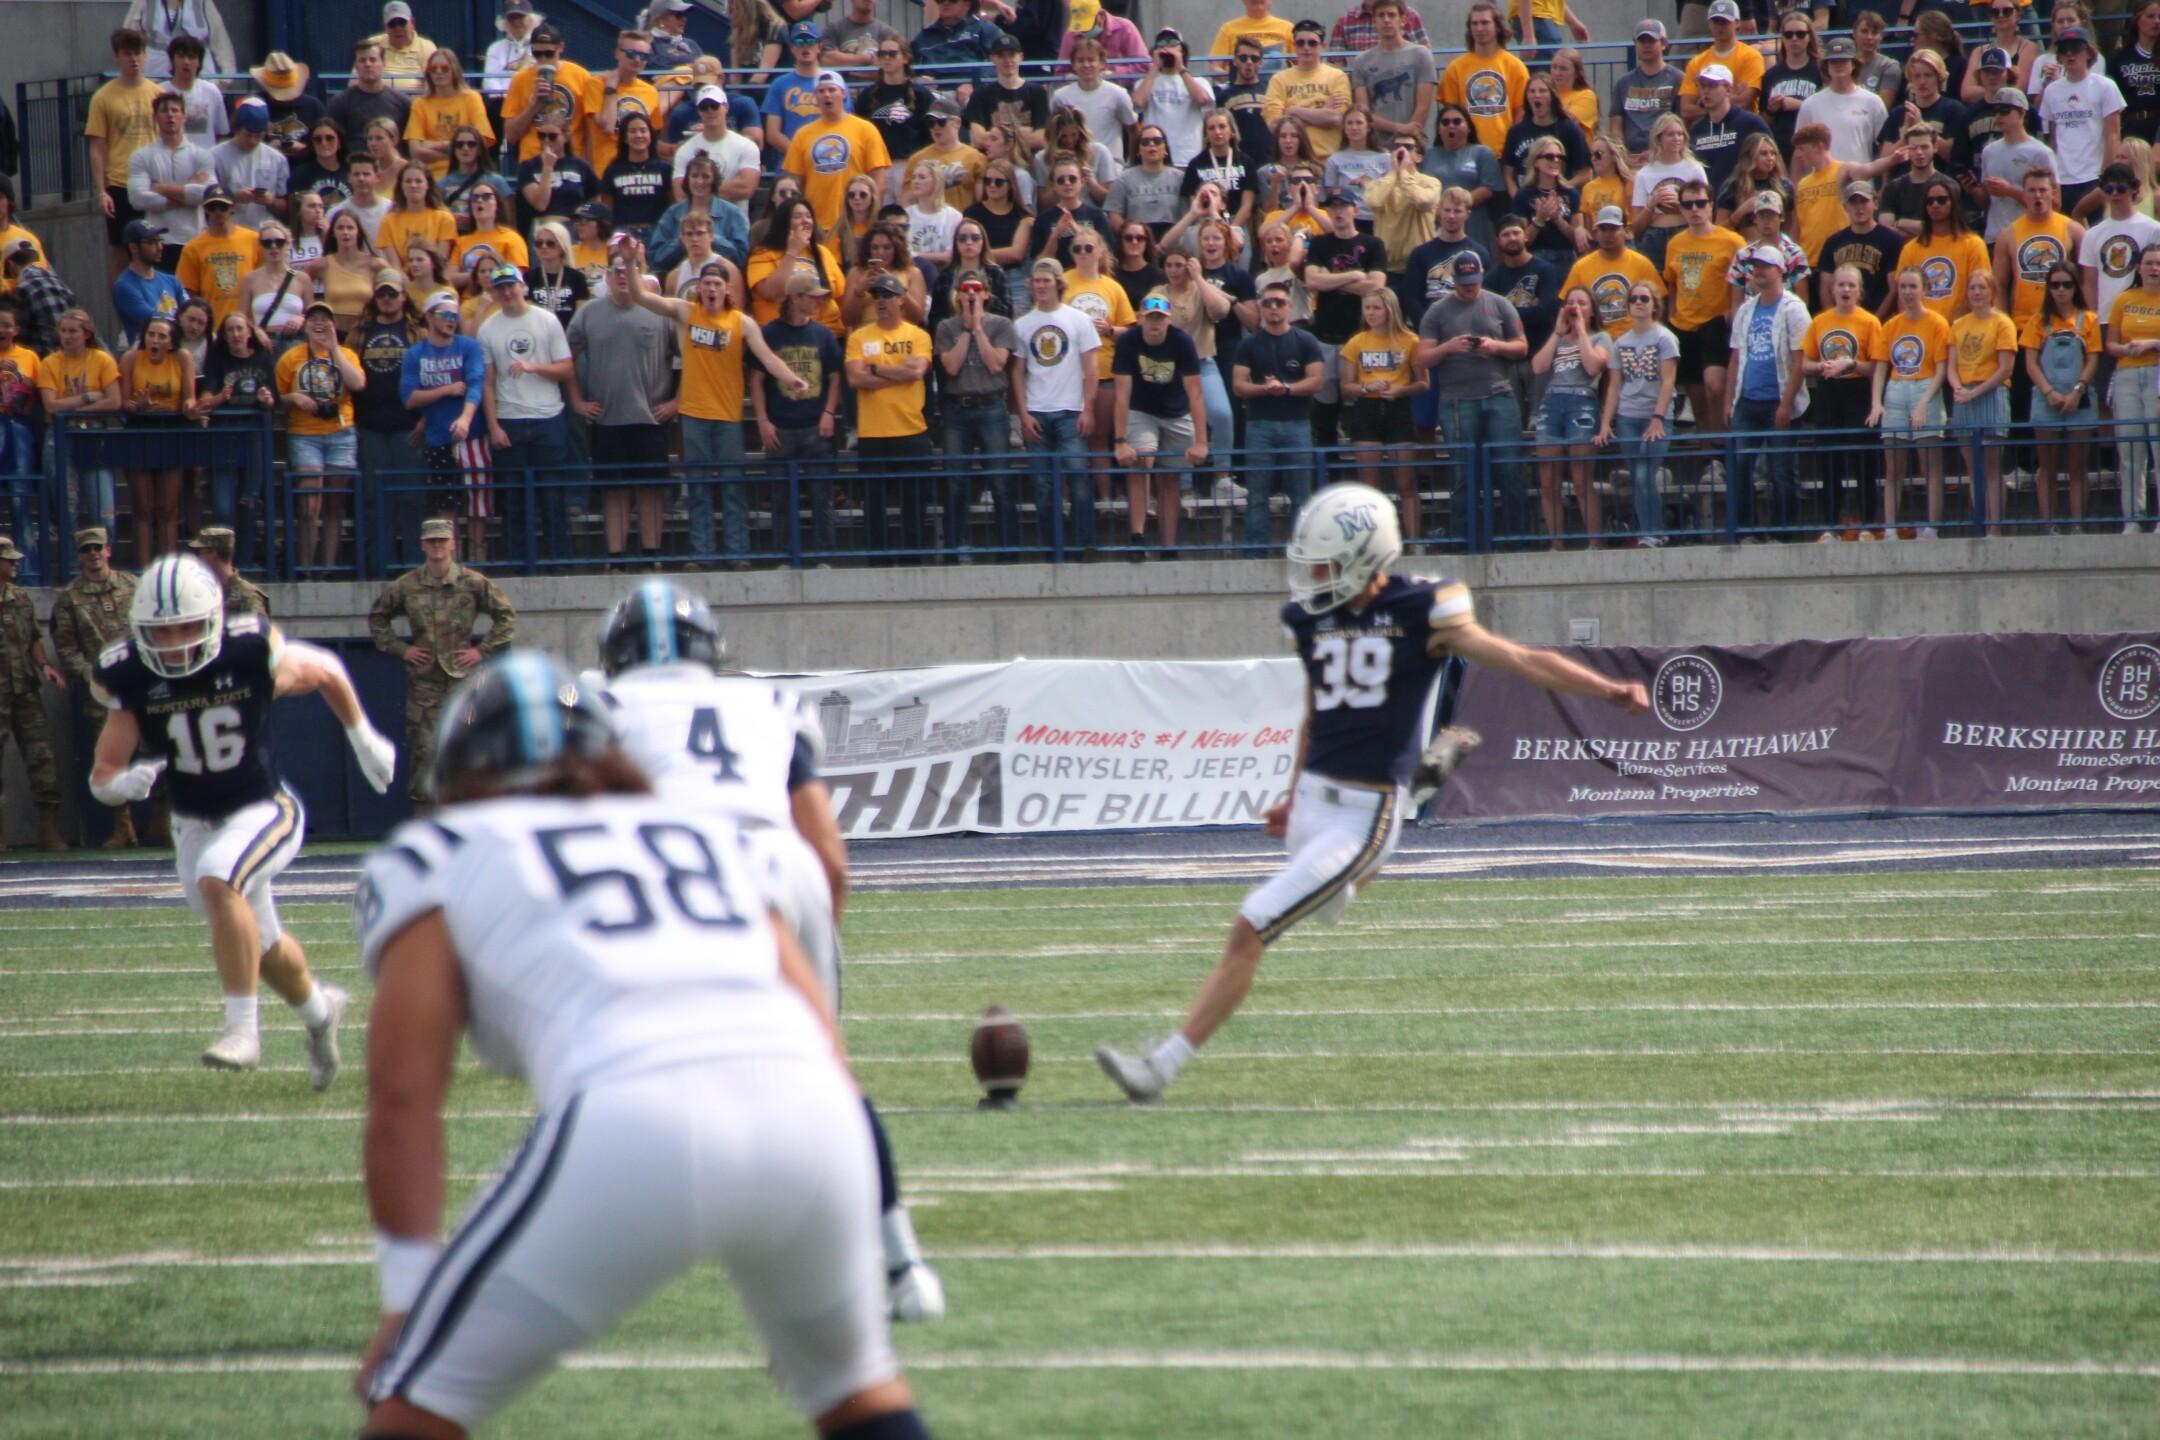 Kicker Blake Glessner kicks off after a touchdown